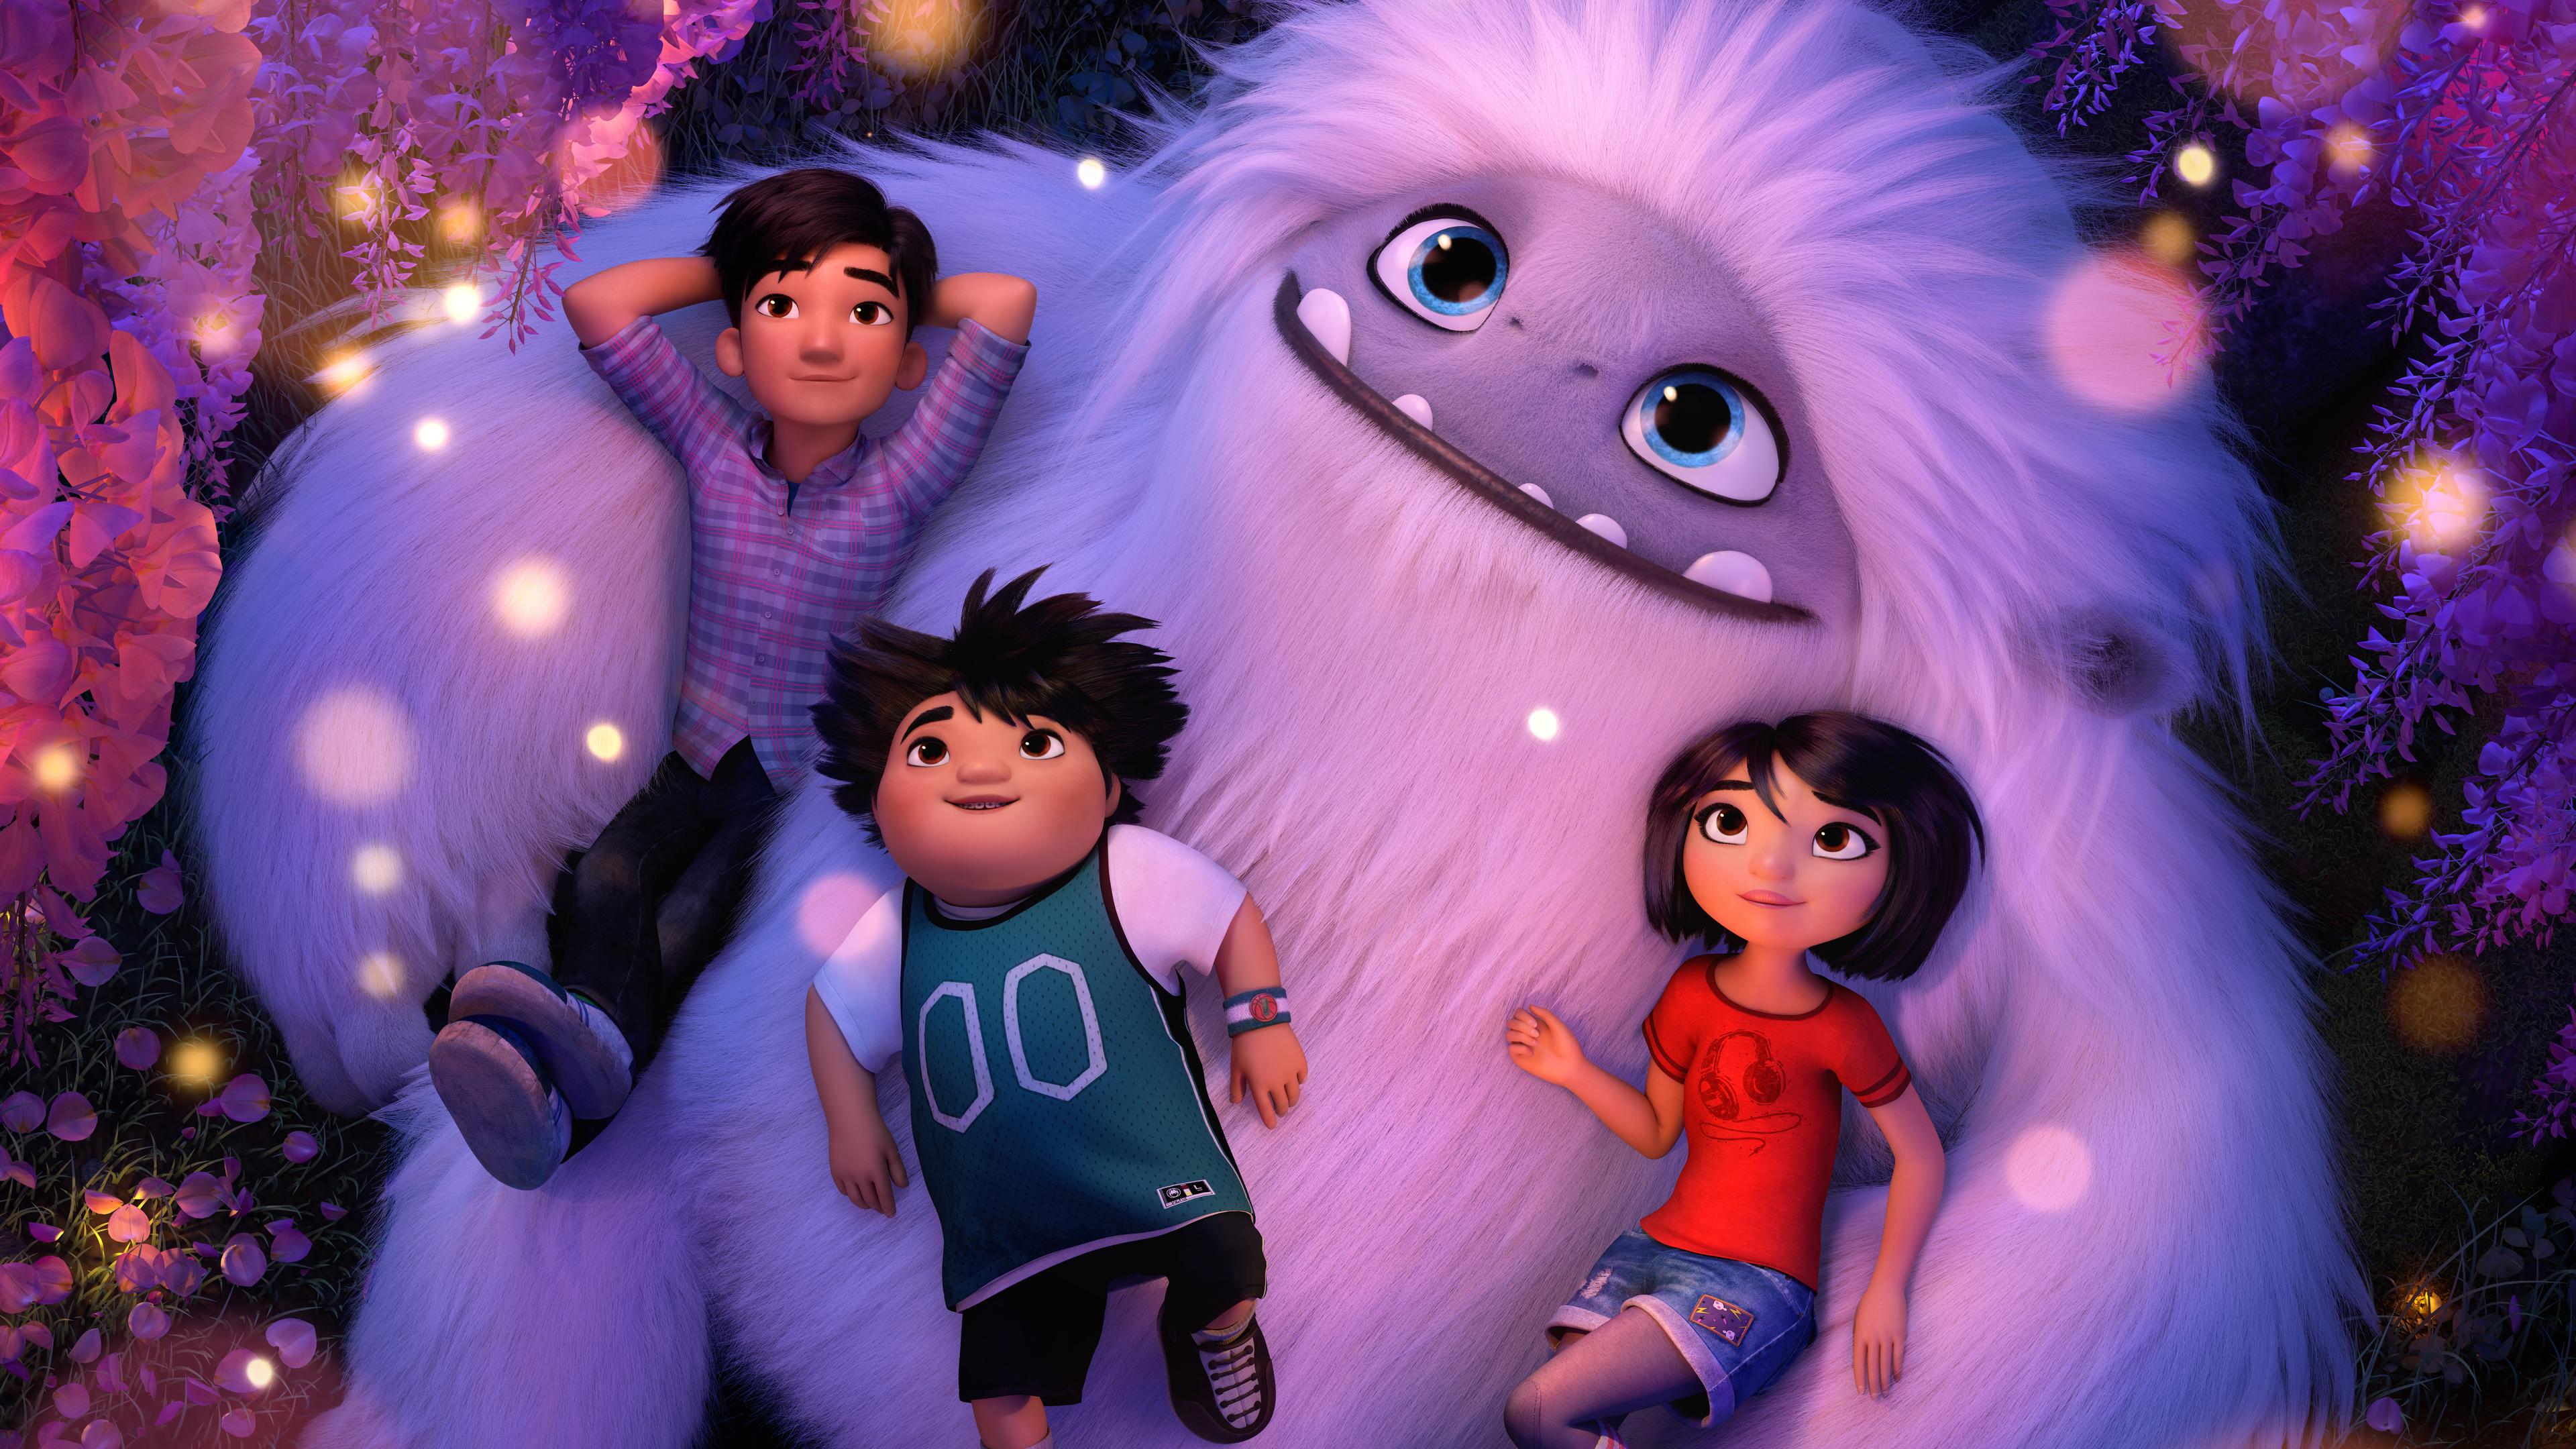 abominable animated movie 1569187393 - Abominable Animated Movie - hd-wallpapers, animated movies wallpapers, abominable wallpapers, 8k wallpapers, 5k wallpapers, 4k-wallpapers, 2019 movies wallpapers